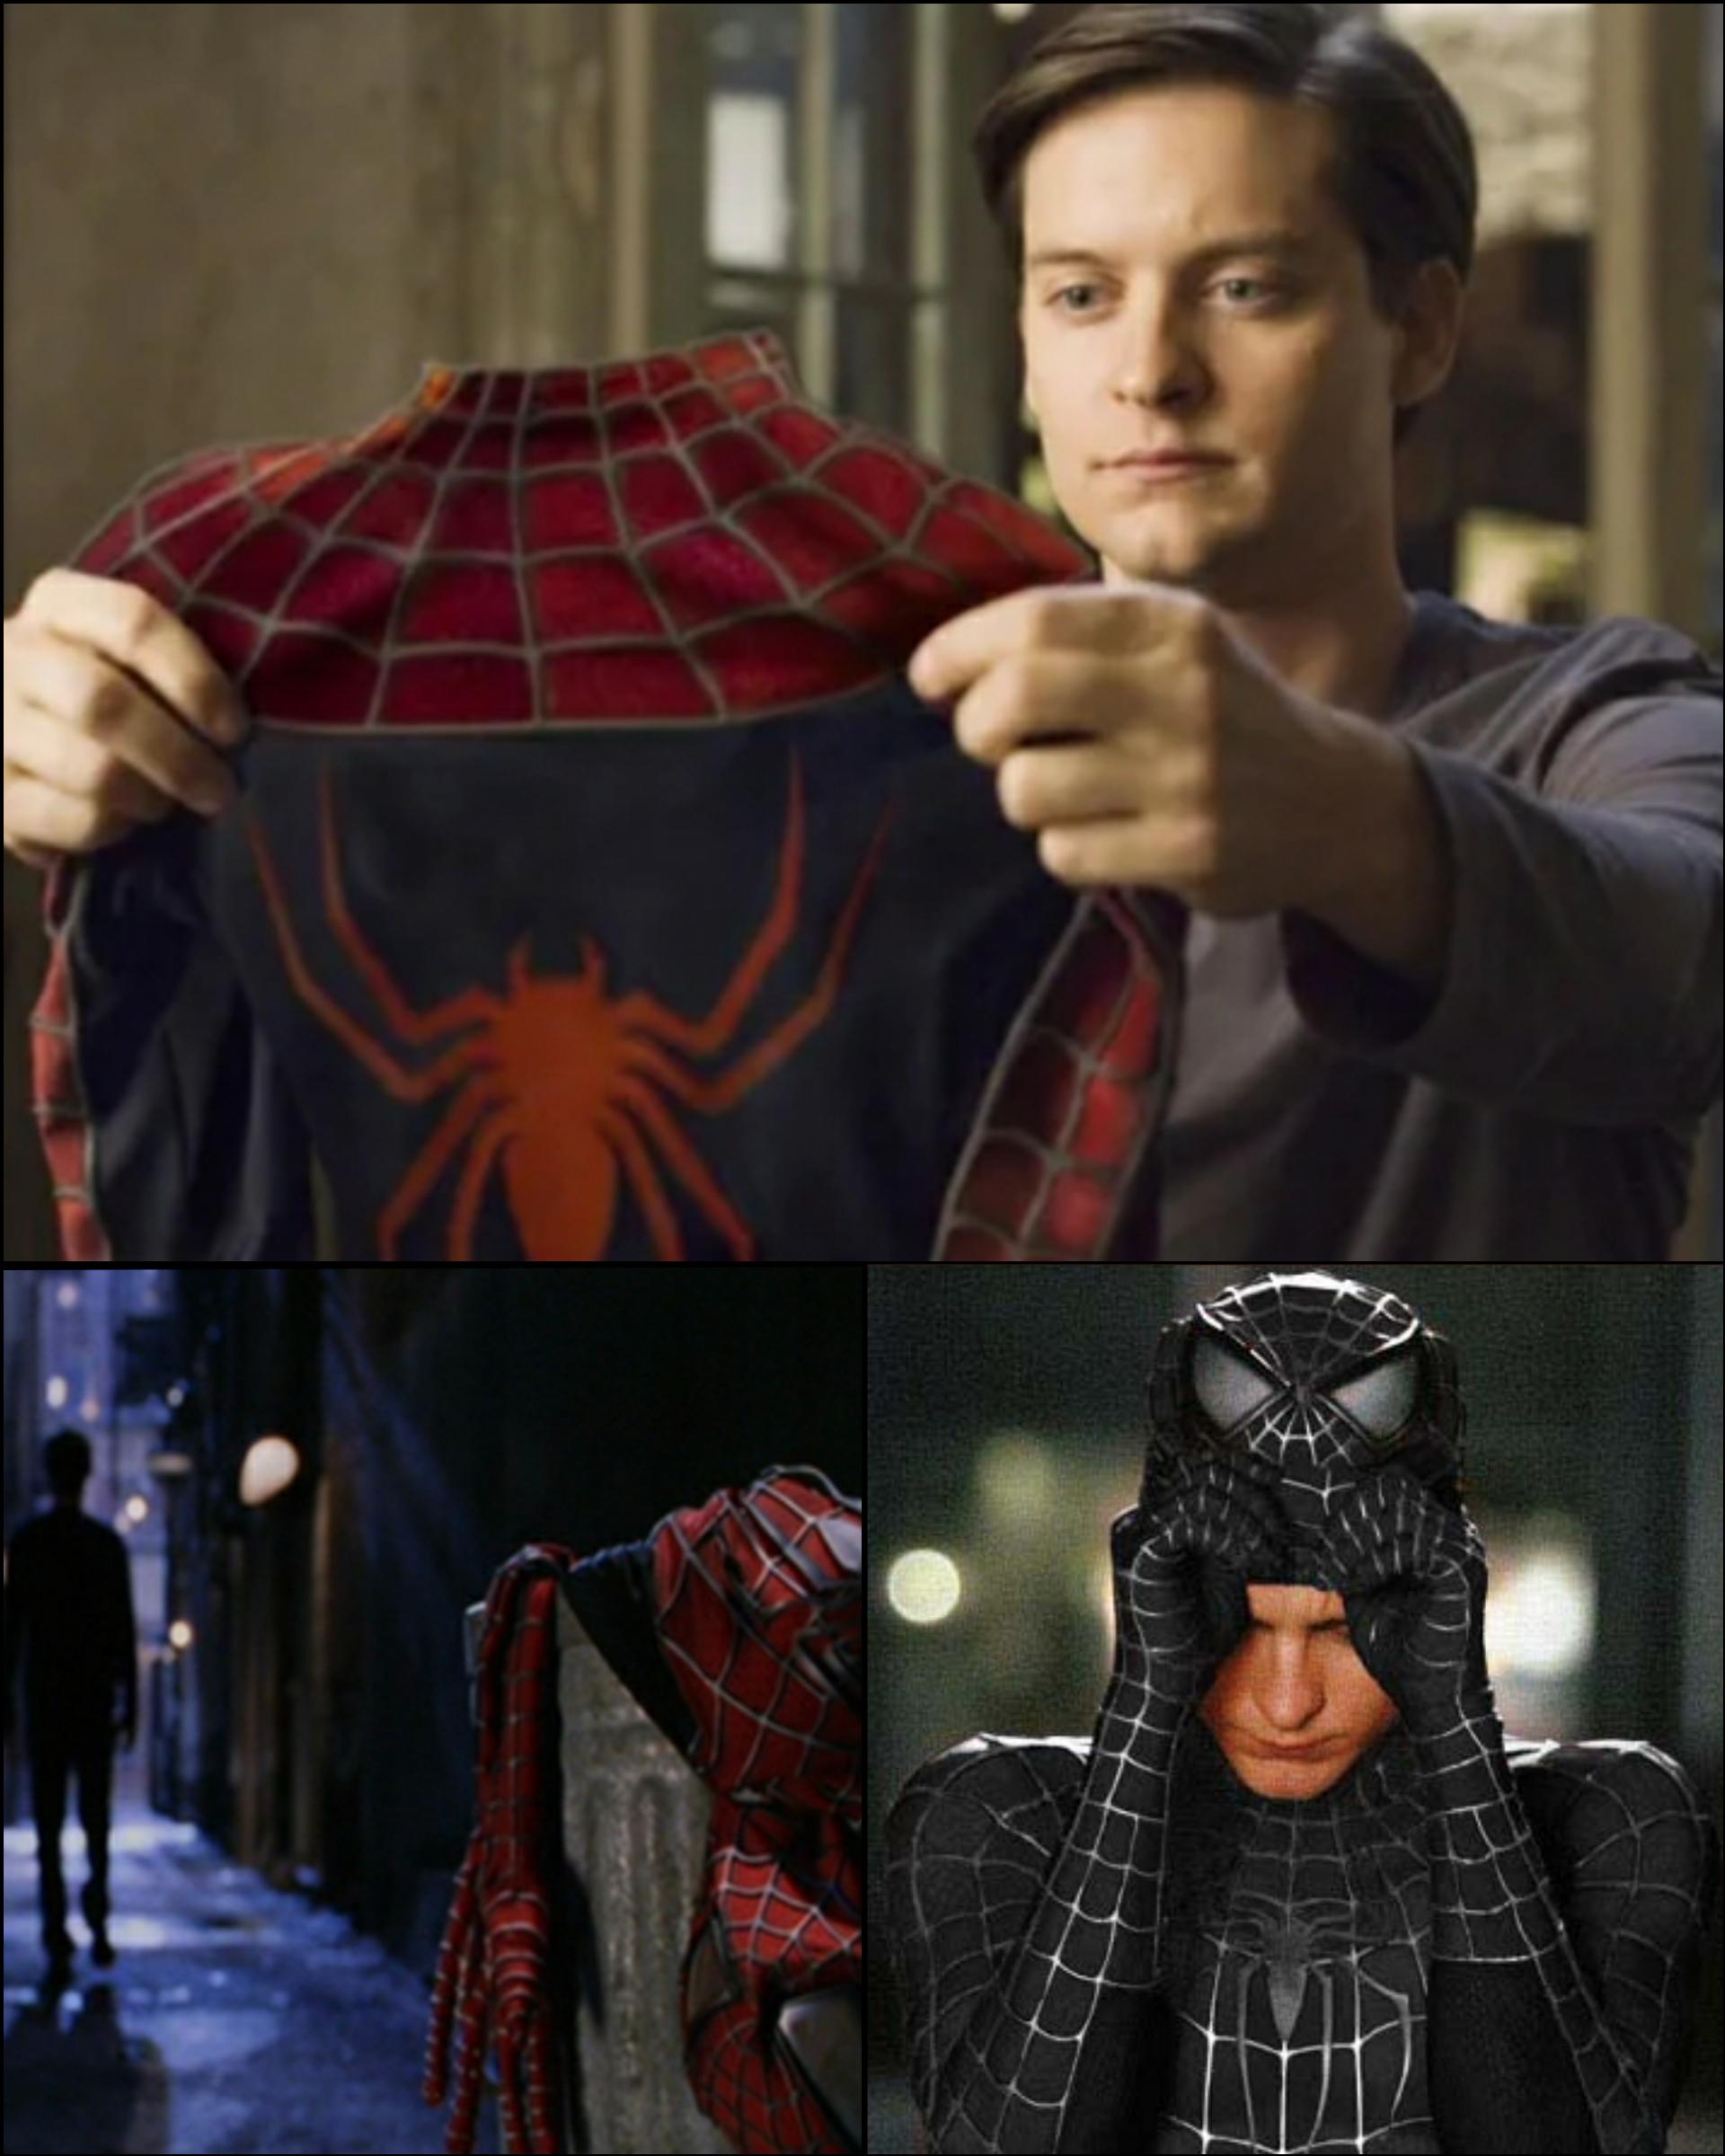 Spiderman 2 Meme : spiderman, Template, Spider-Man, Throwing, Classic, Costume, Putting, Black